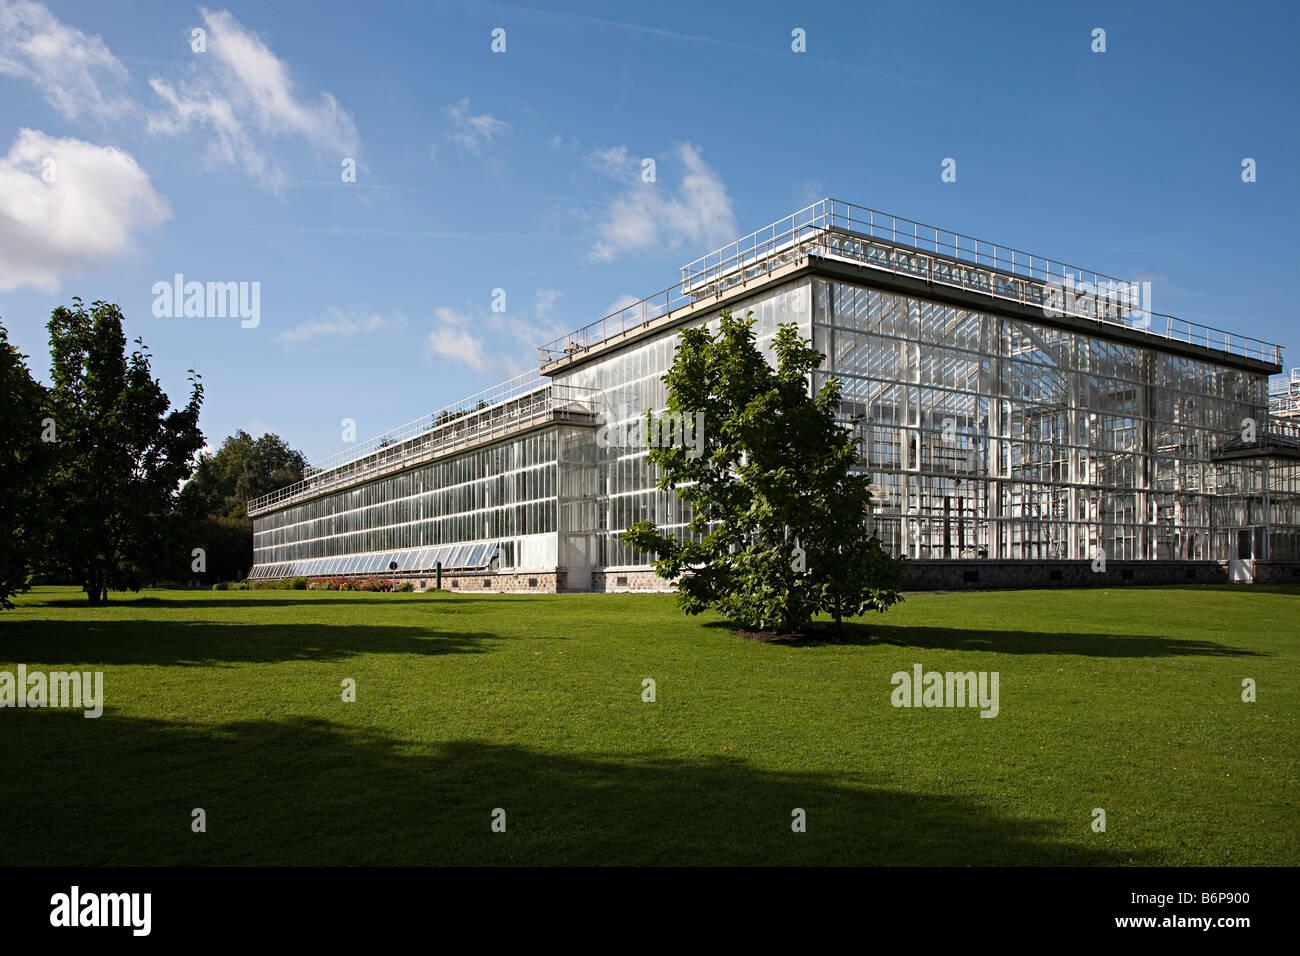 Greenhouse at National Botanic Gardens Nationale Plantentuin Meise Brussels Belgium - Stock Image